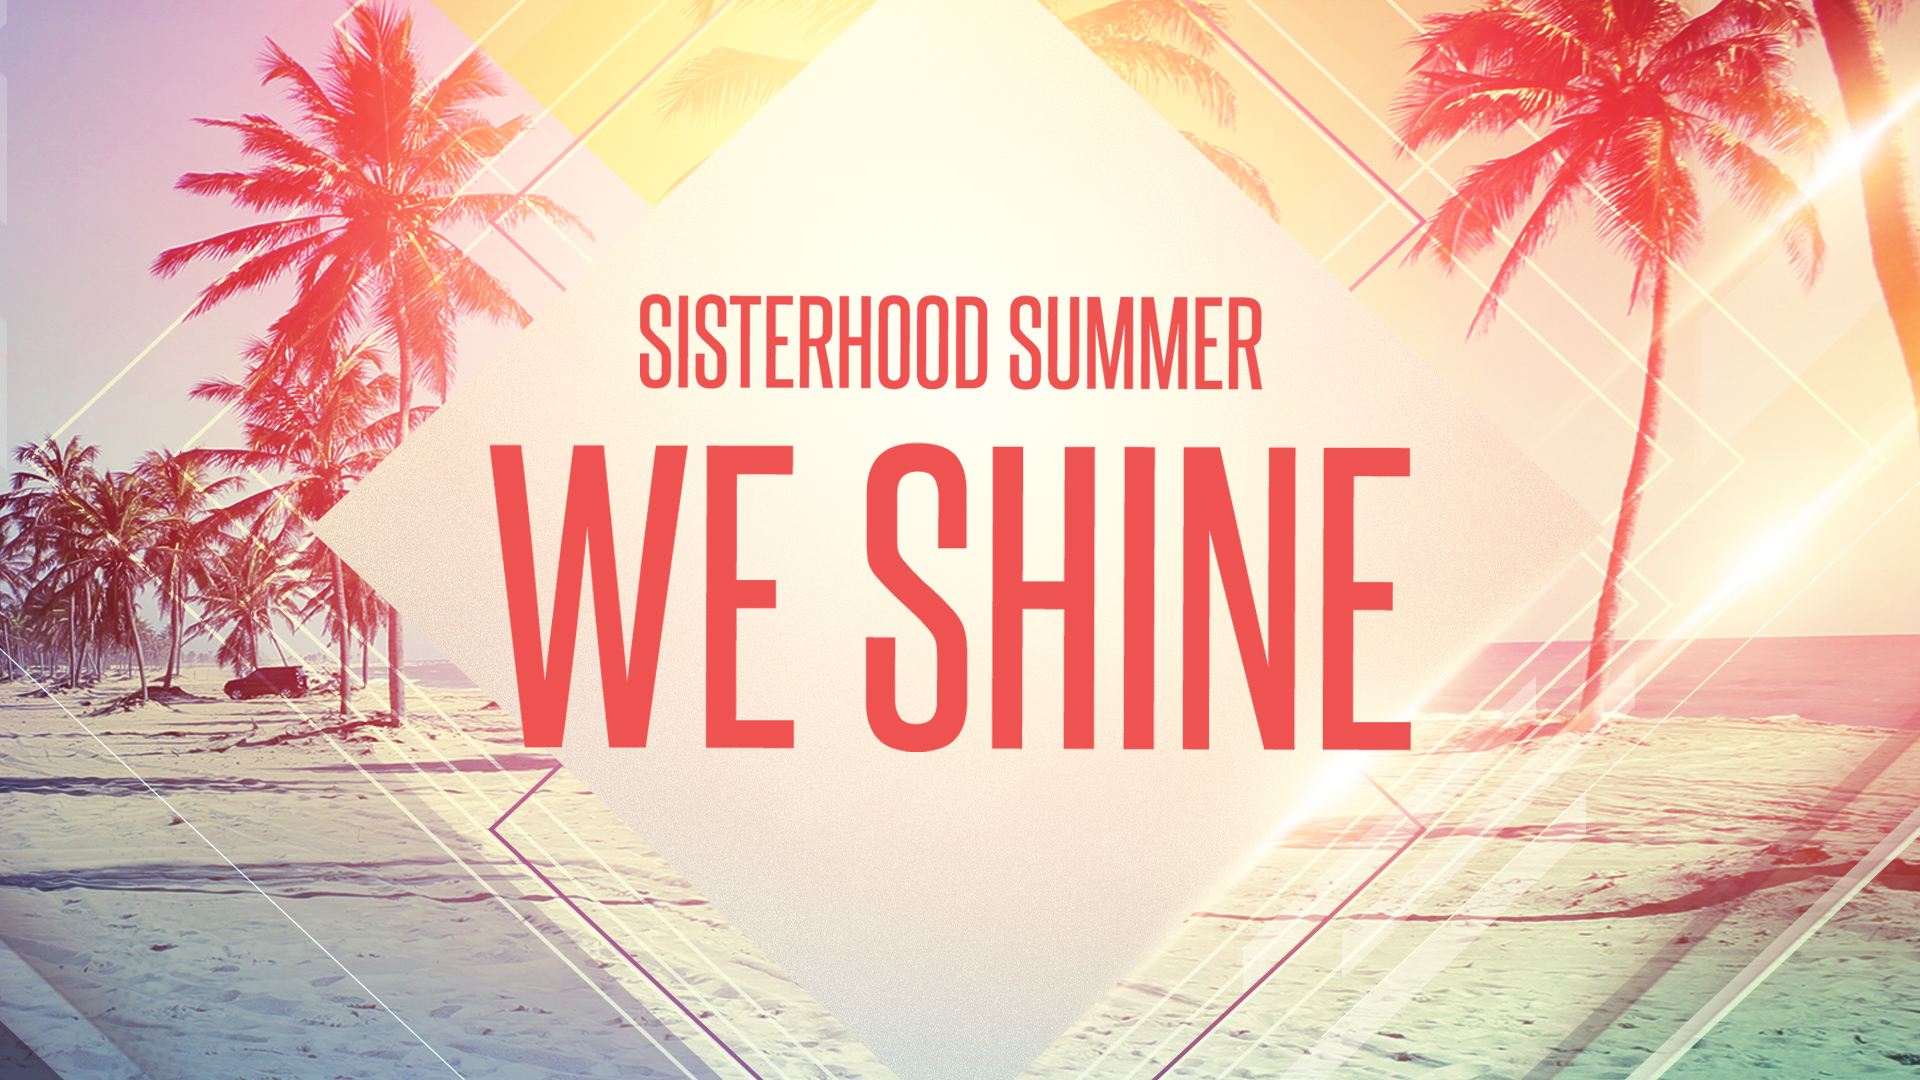 Sisterhood Summer 2019 Sermon Slide.jpg